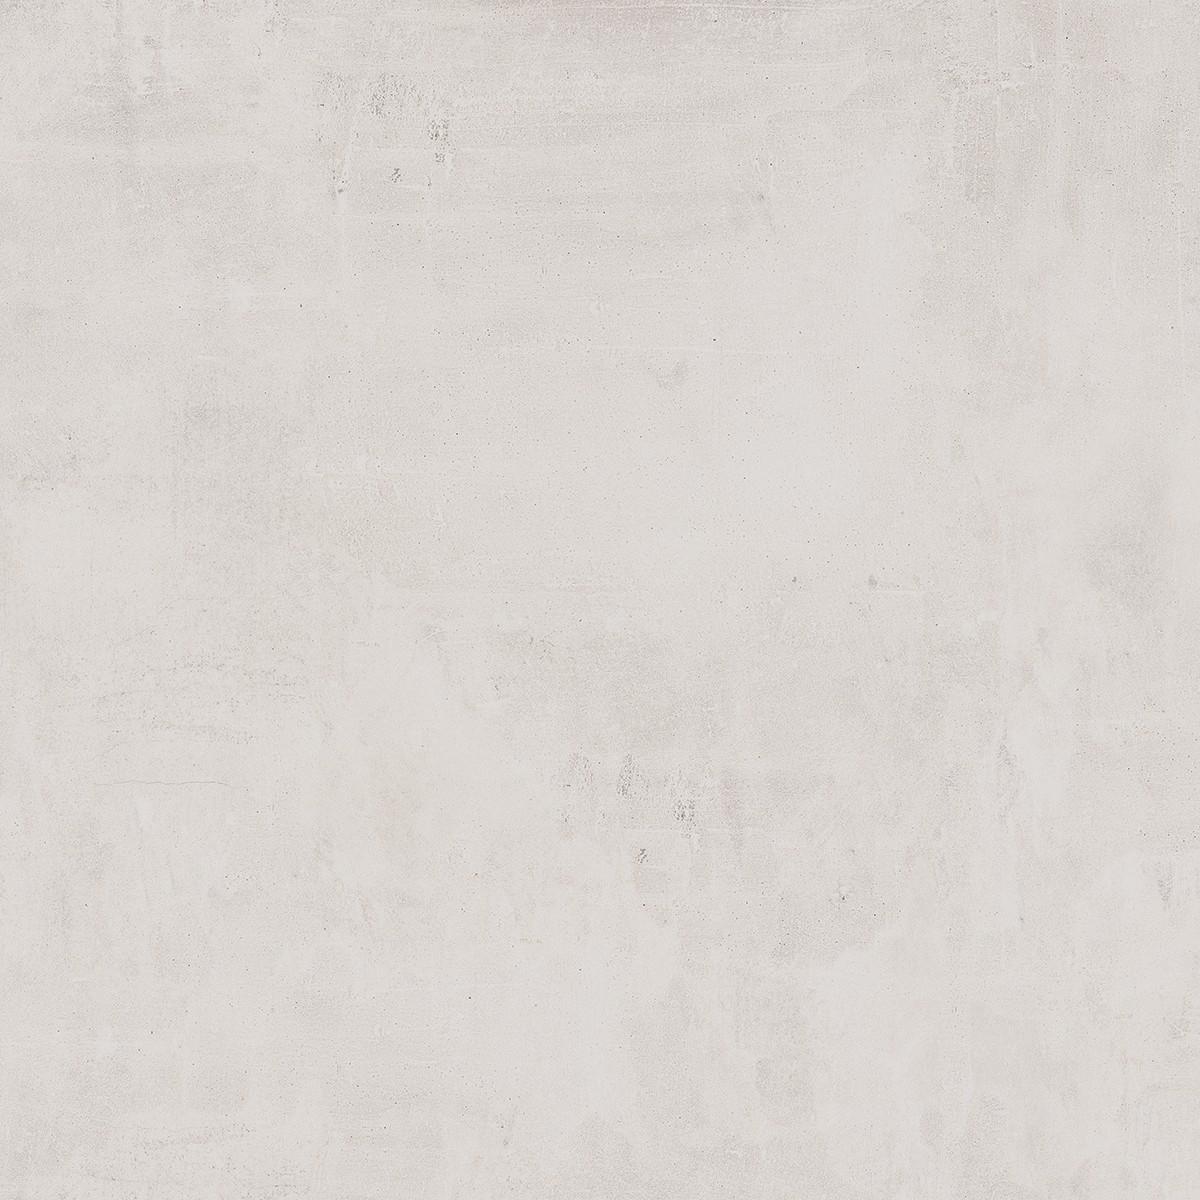 Londres Blanc Polido 73x73cm